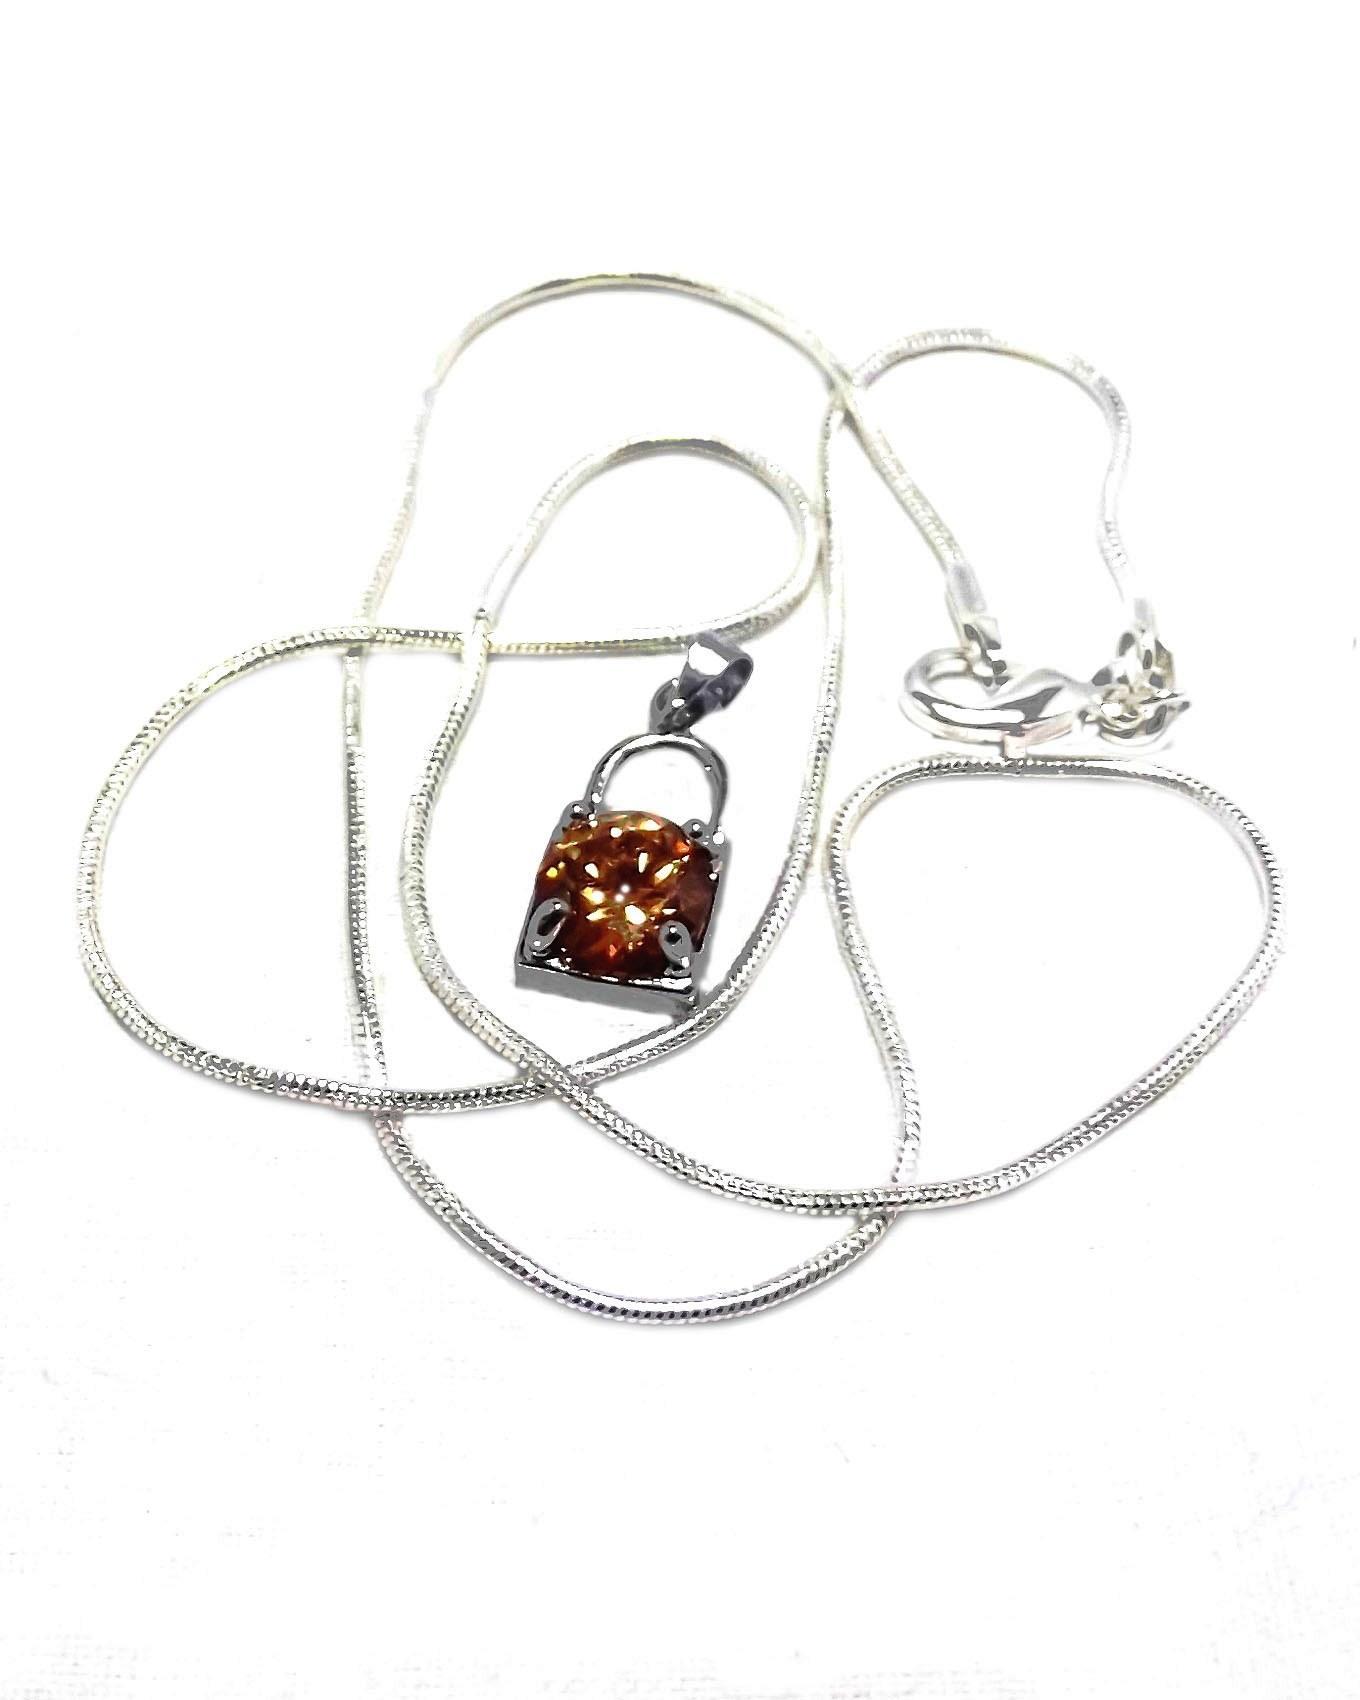 Women's Nirin Silver Pendant Necklace